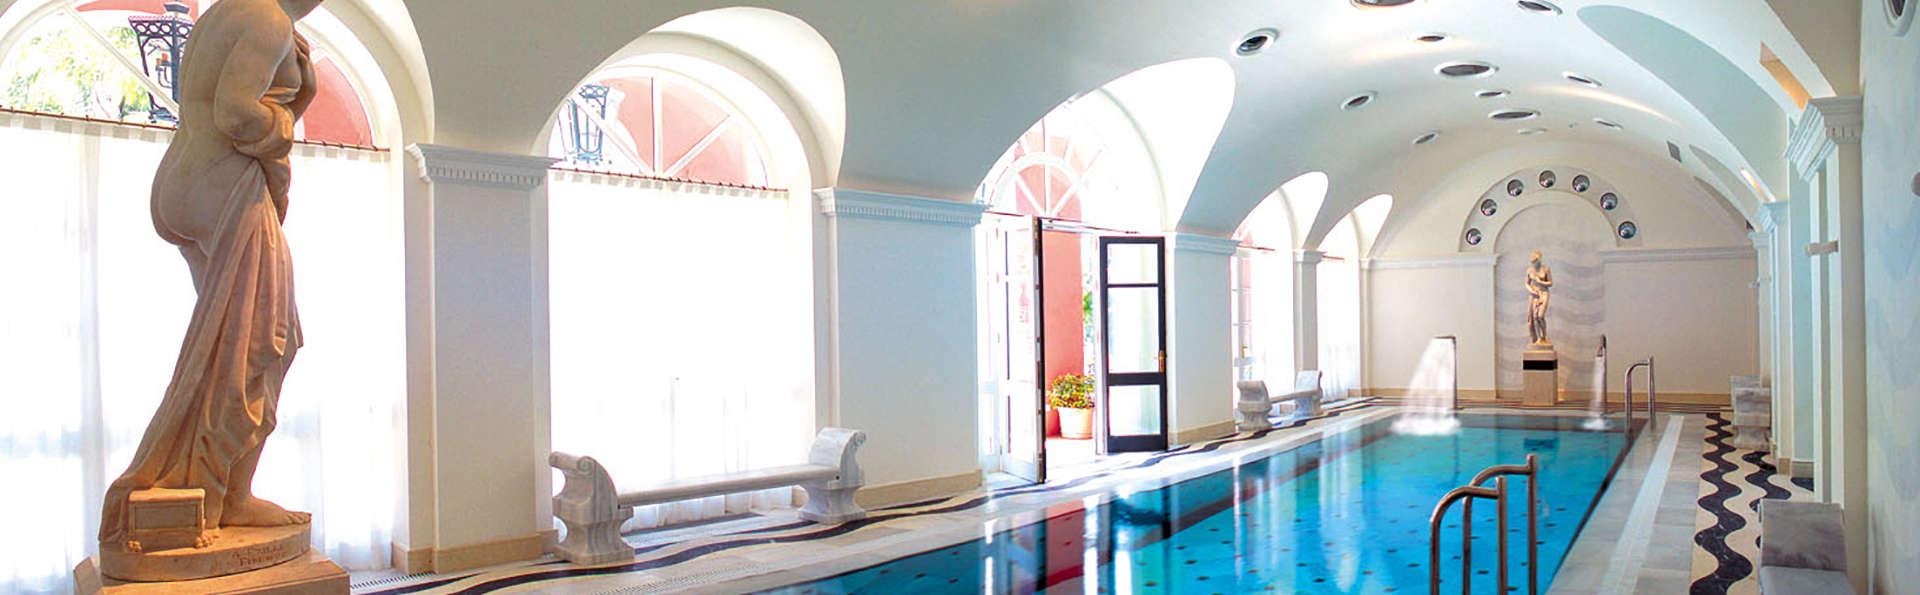 Villa Padierna Palace Hotel - edit_pool2.jpg